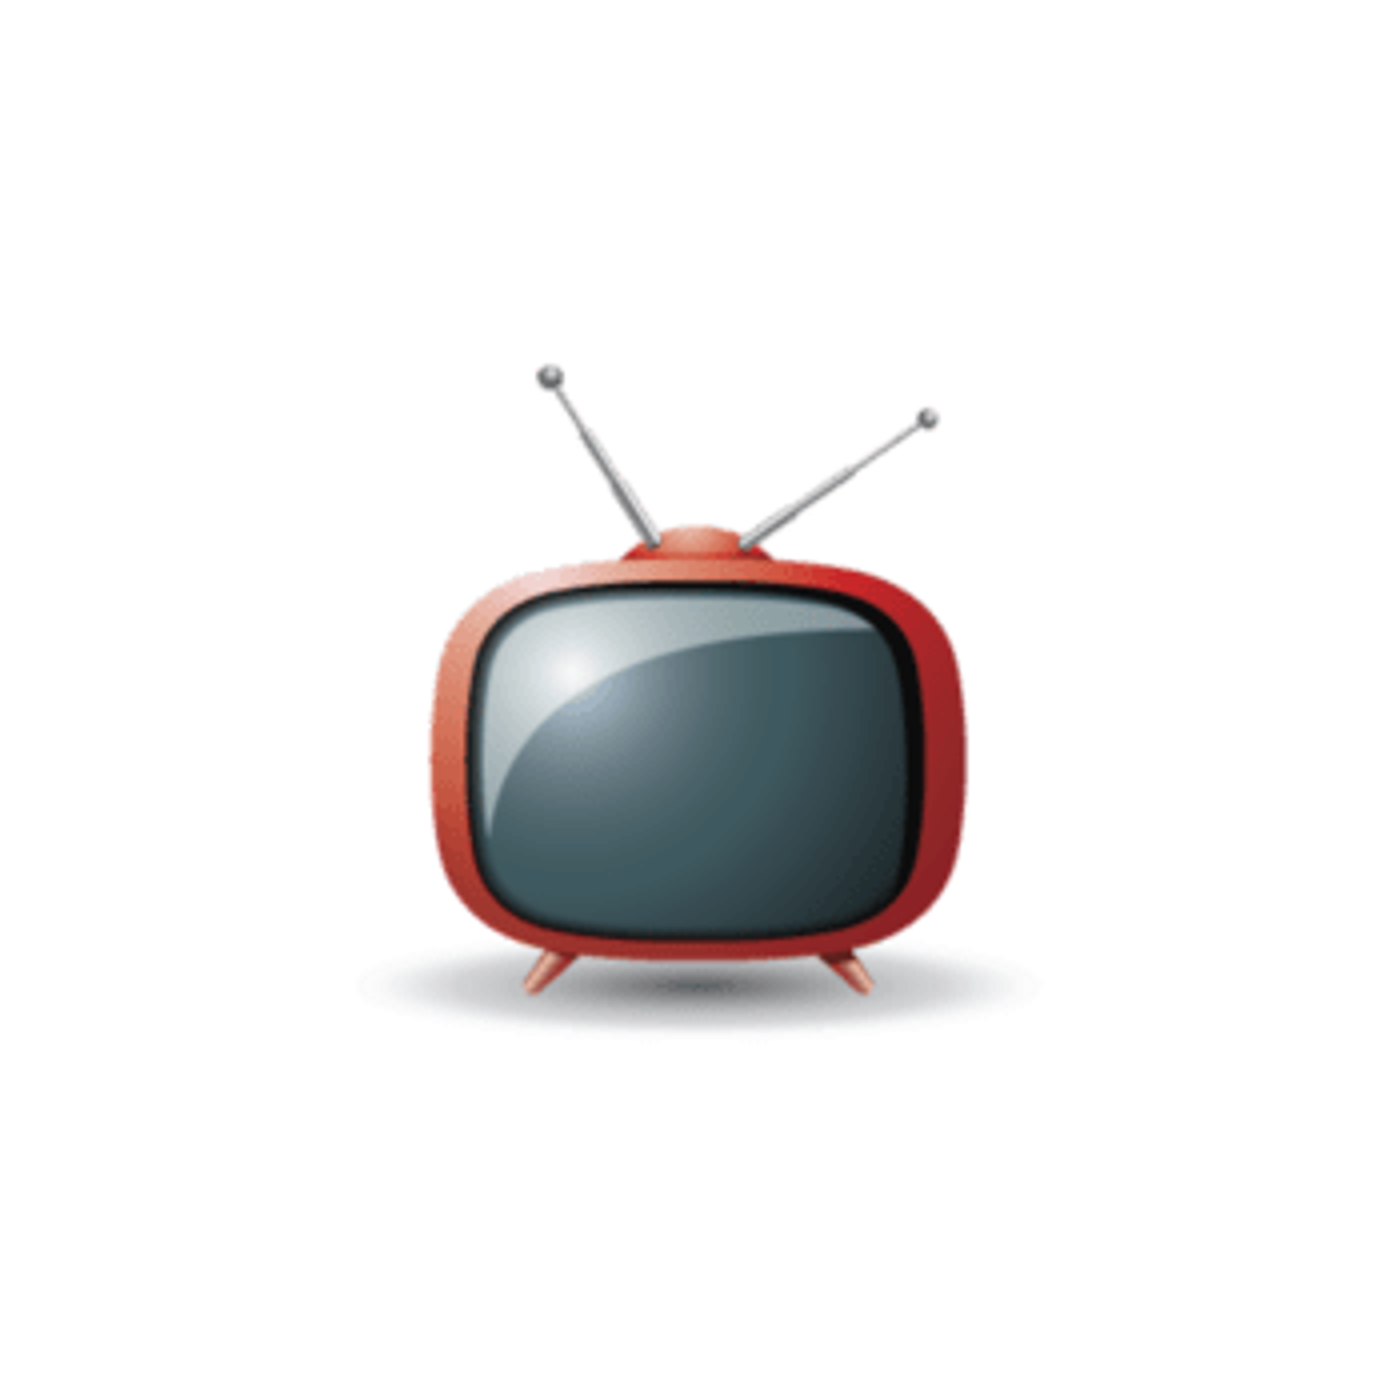 Smart TV Share 1.02